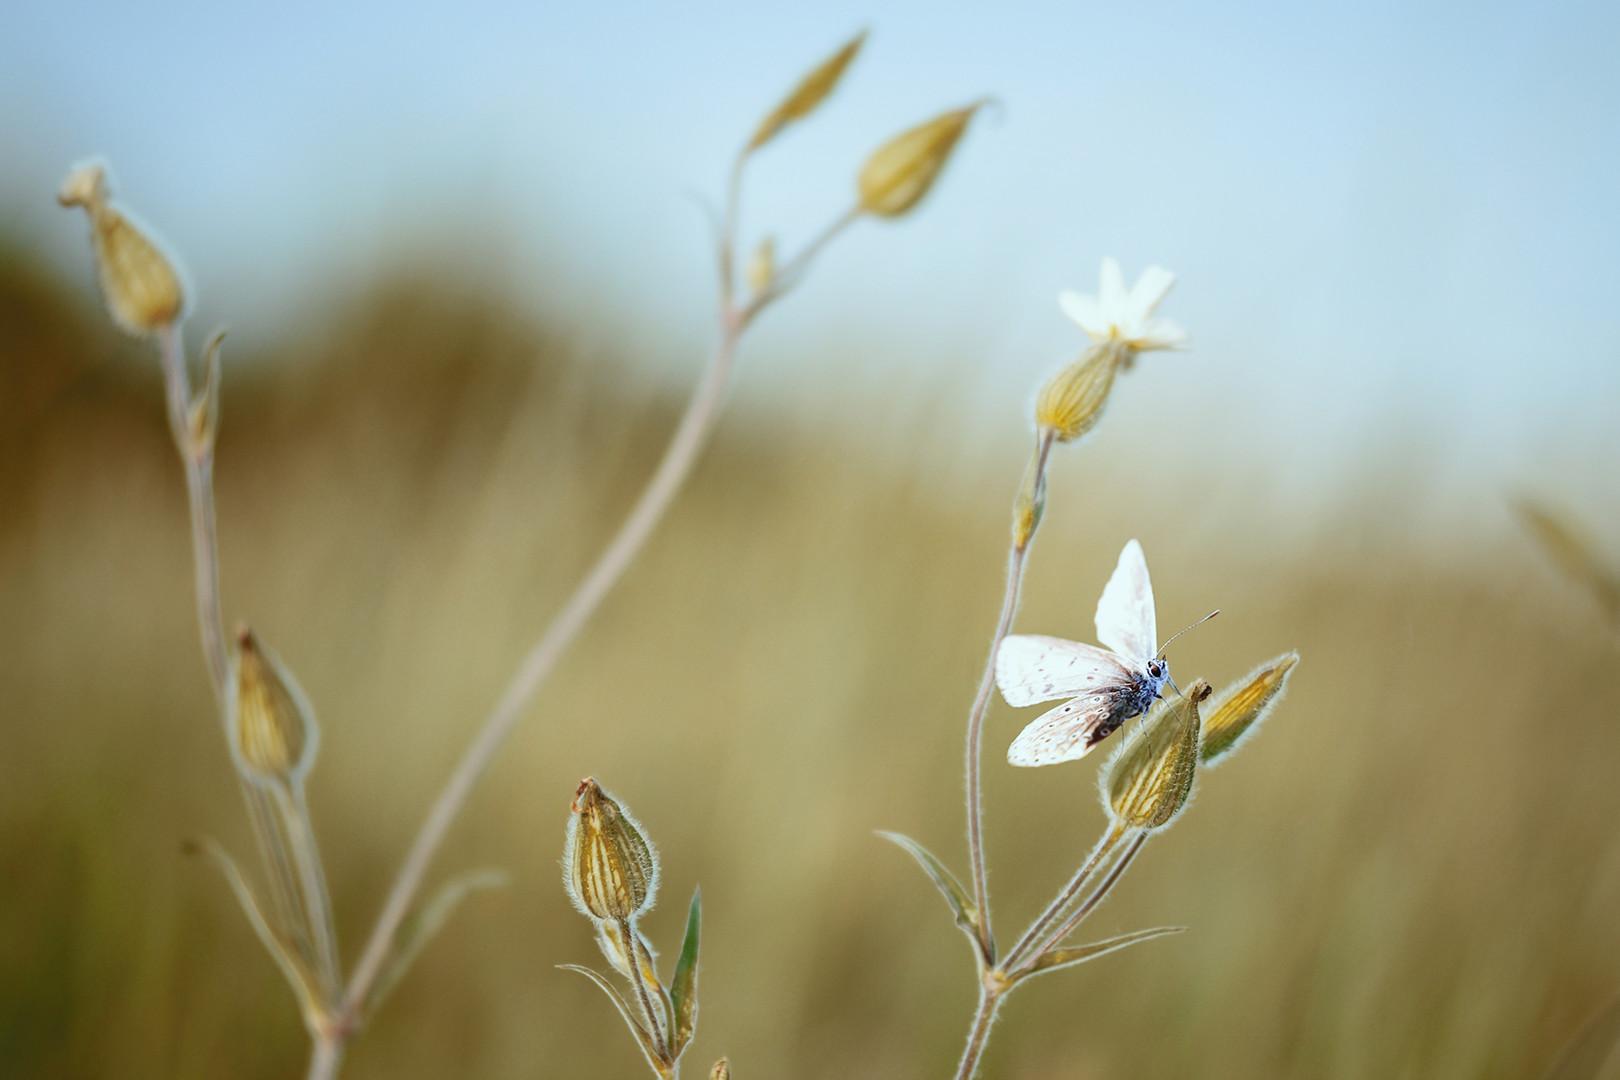 Leptirićko